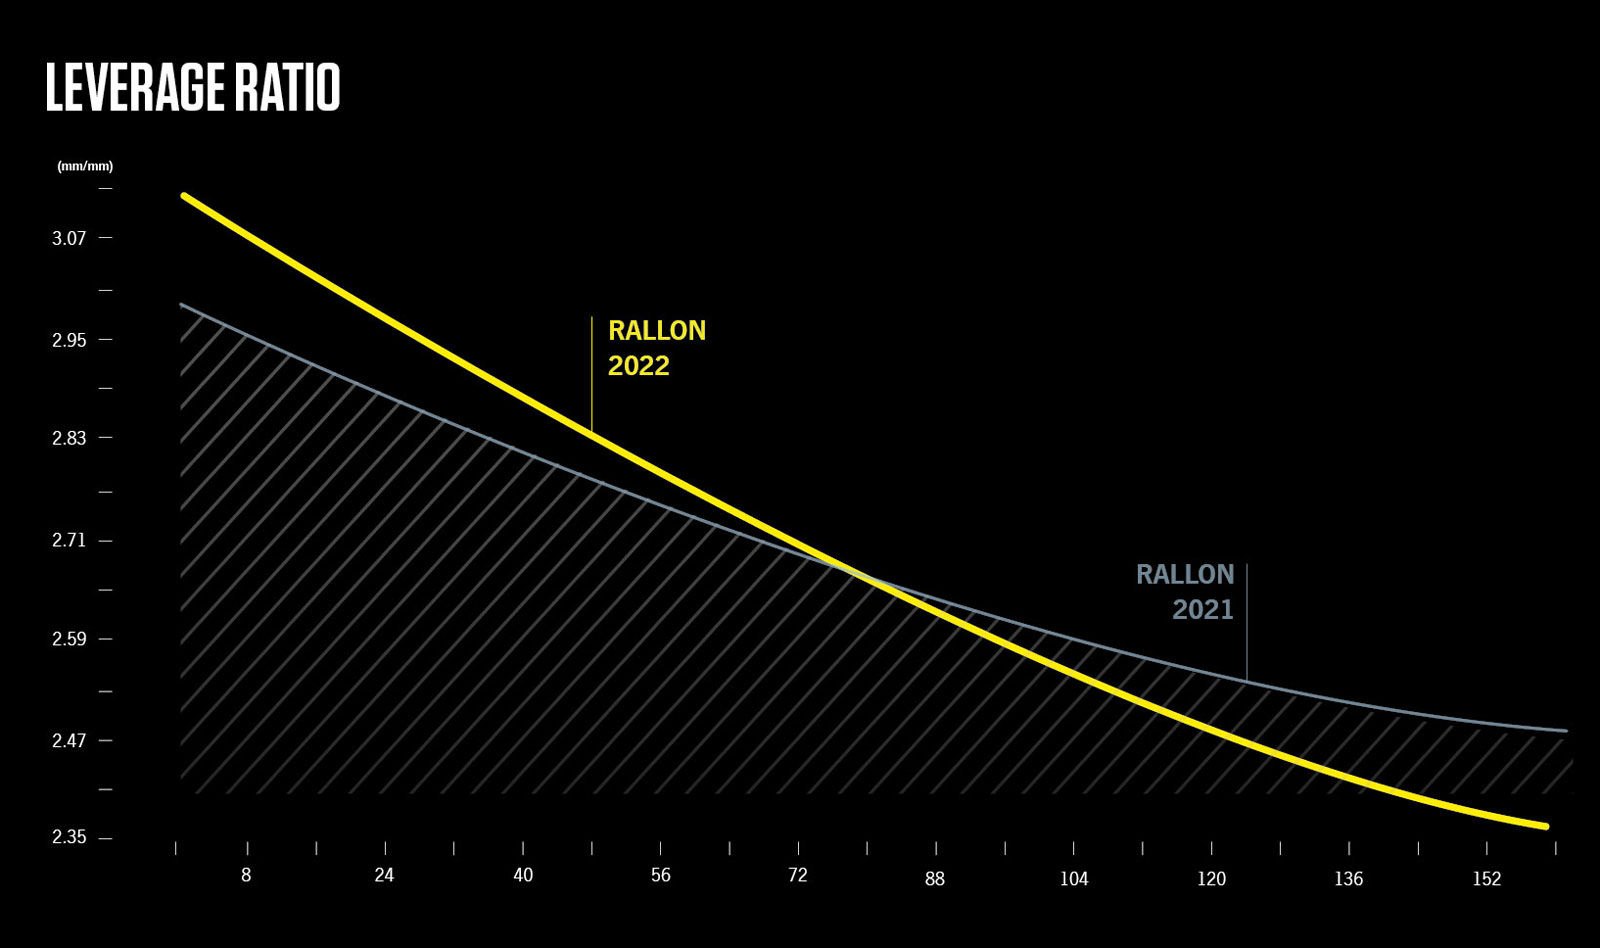 2022 orbea rallon leverage ration versus 2020 frame